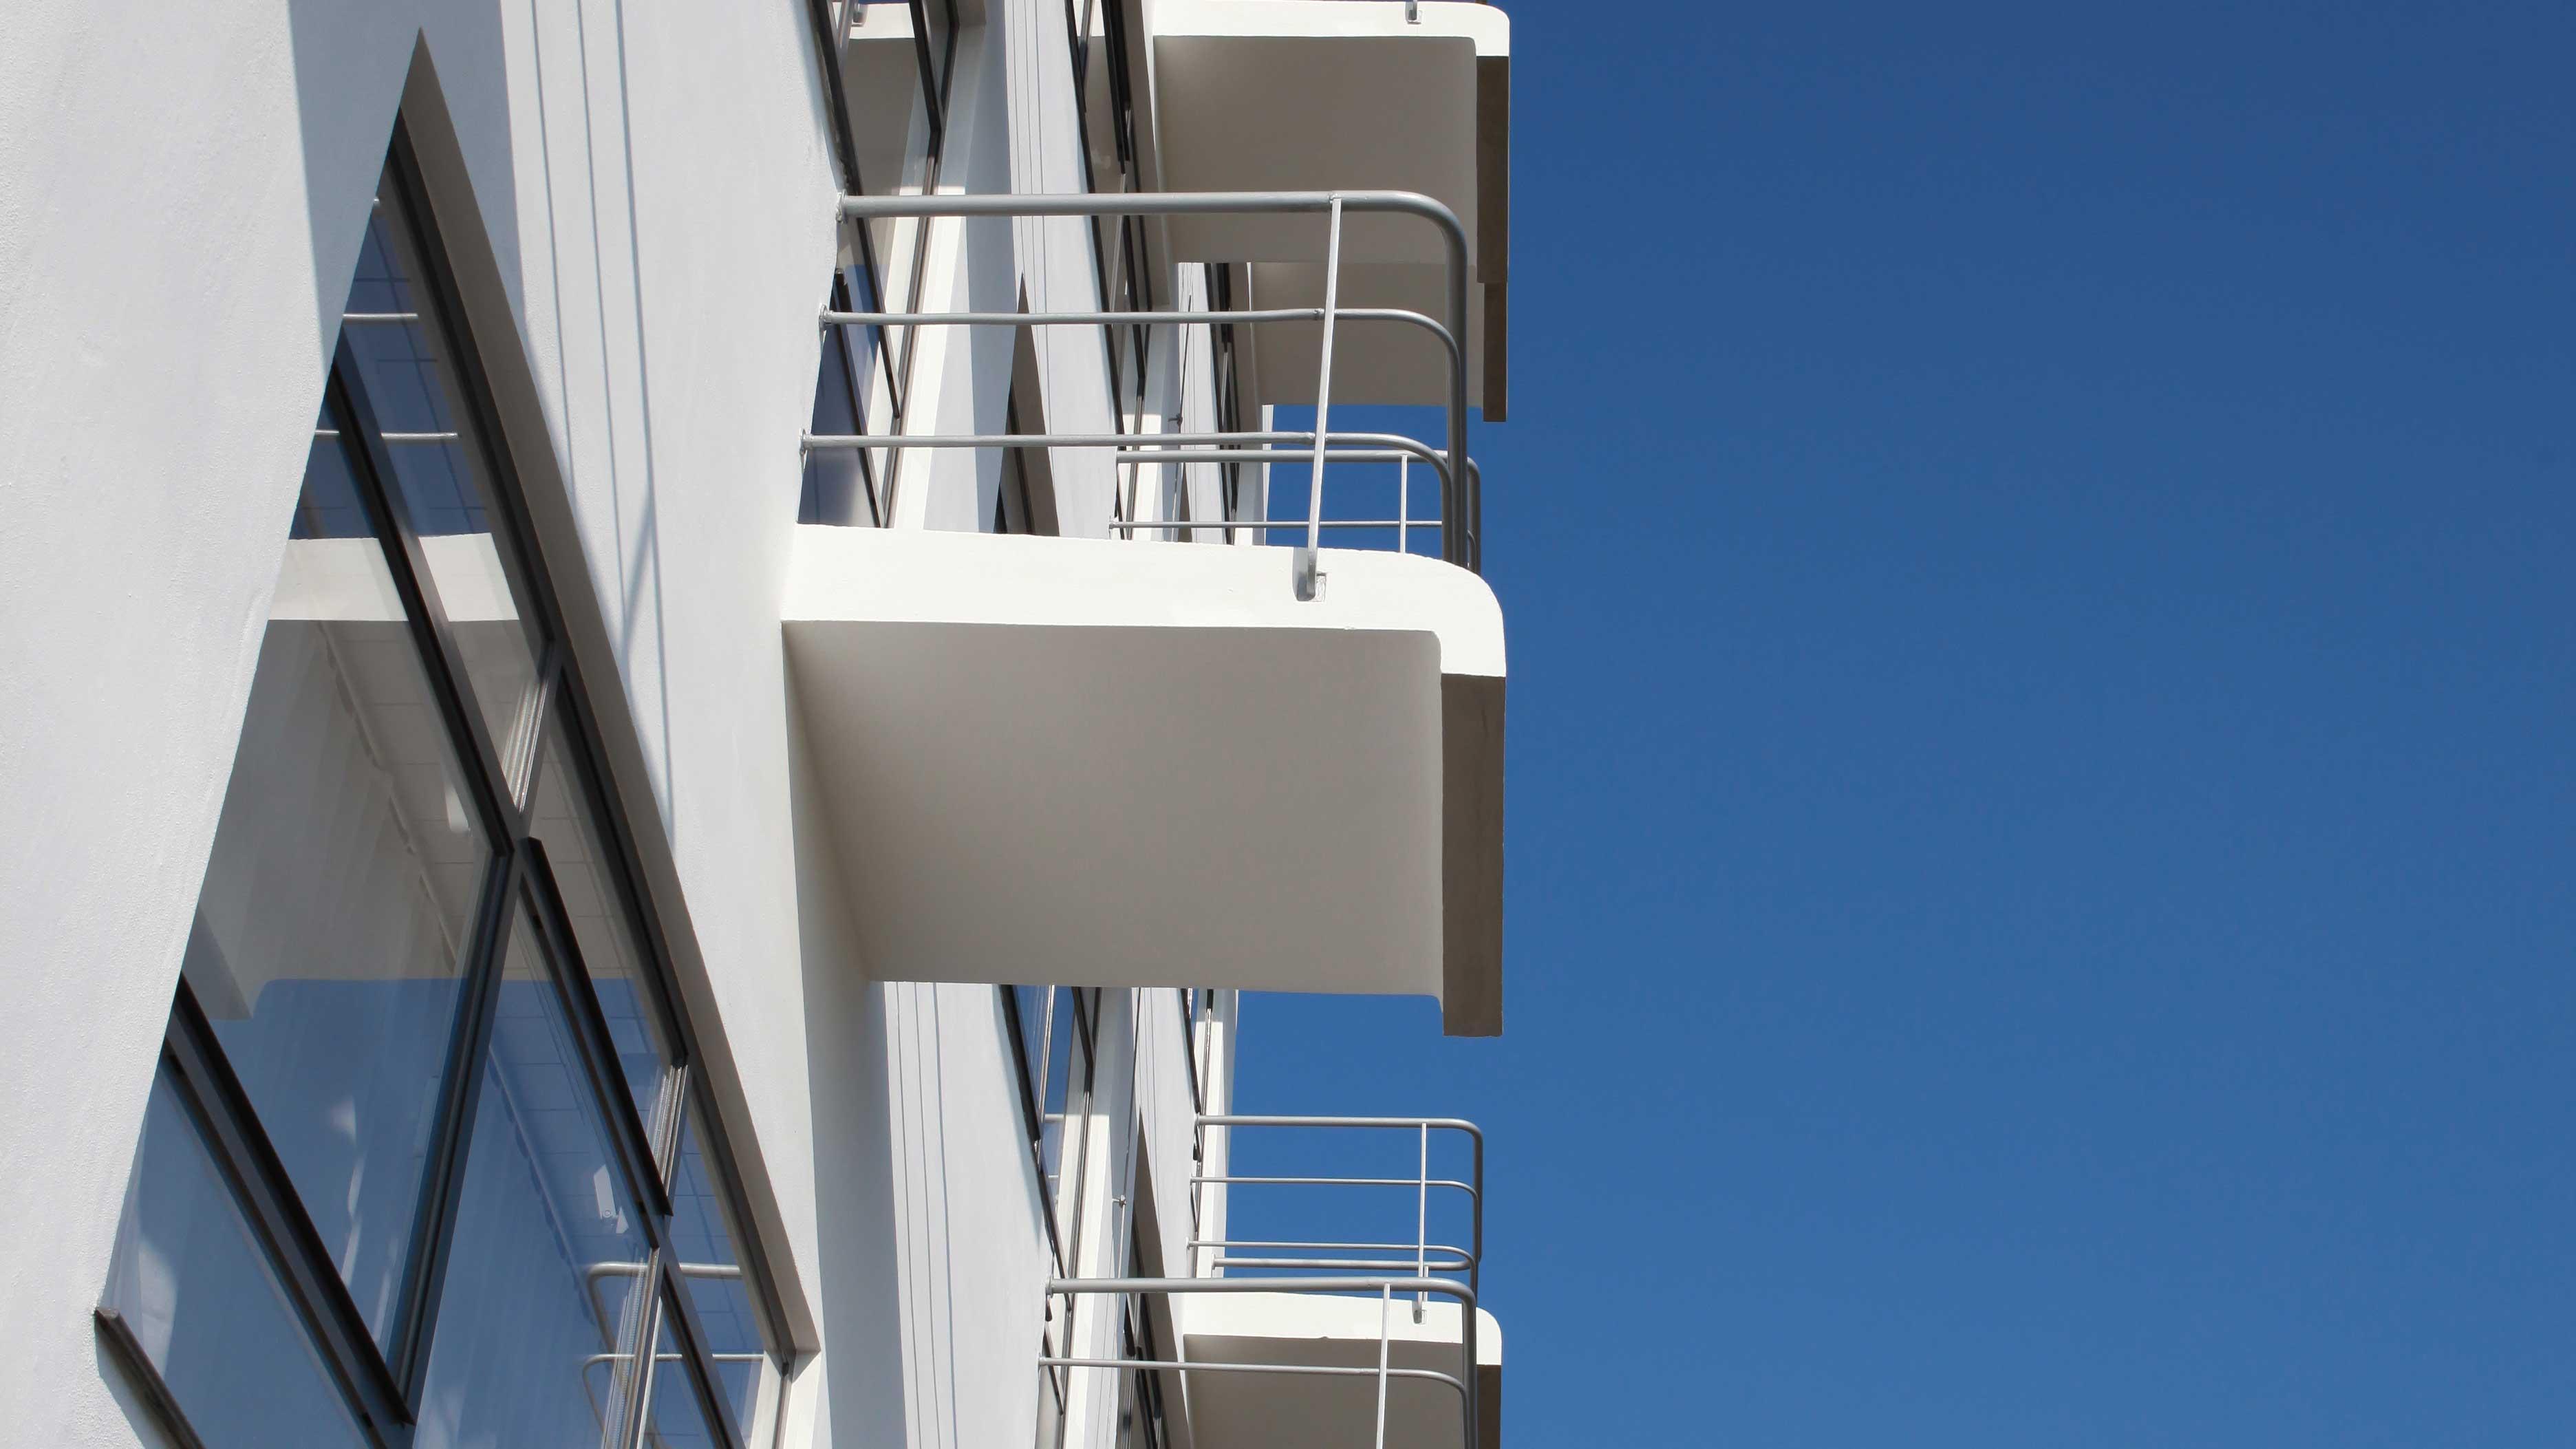 Bauhaus Dessau 2